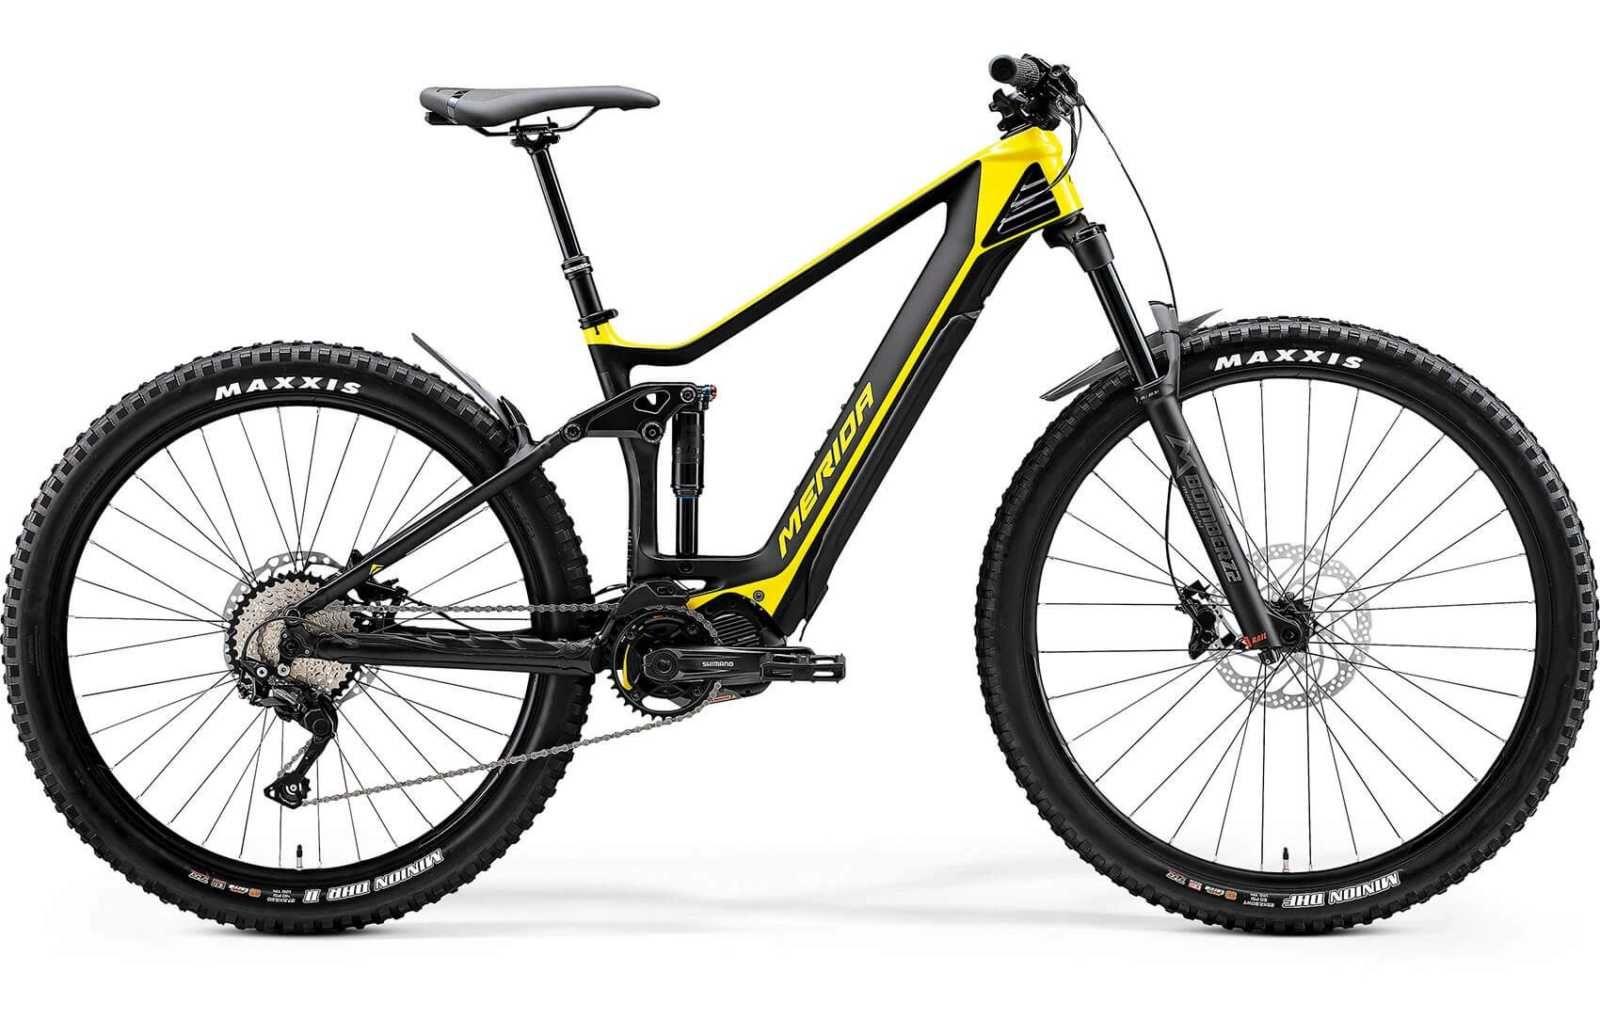 Bicicleta Merida Eone Forty 5000 En Talla M 52416 Categoría Bicicleta Eléctrica De Montaña Año 2020 Cam Bicicletas Merida Bicicleta Electrica Bicicletas